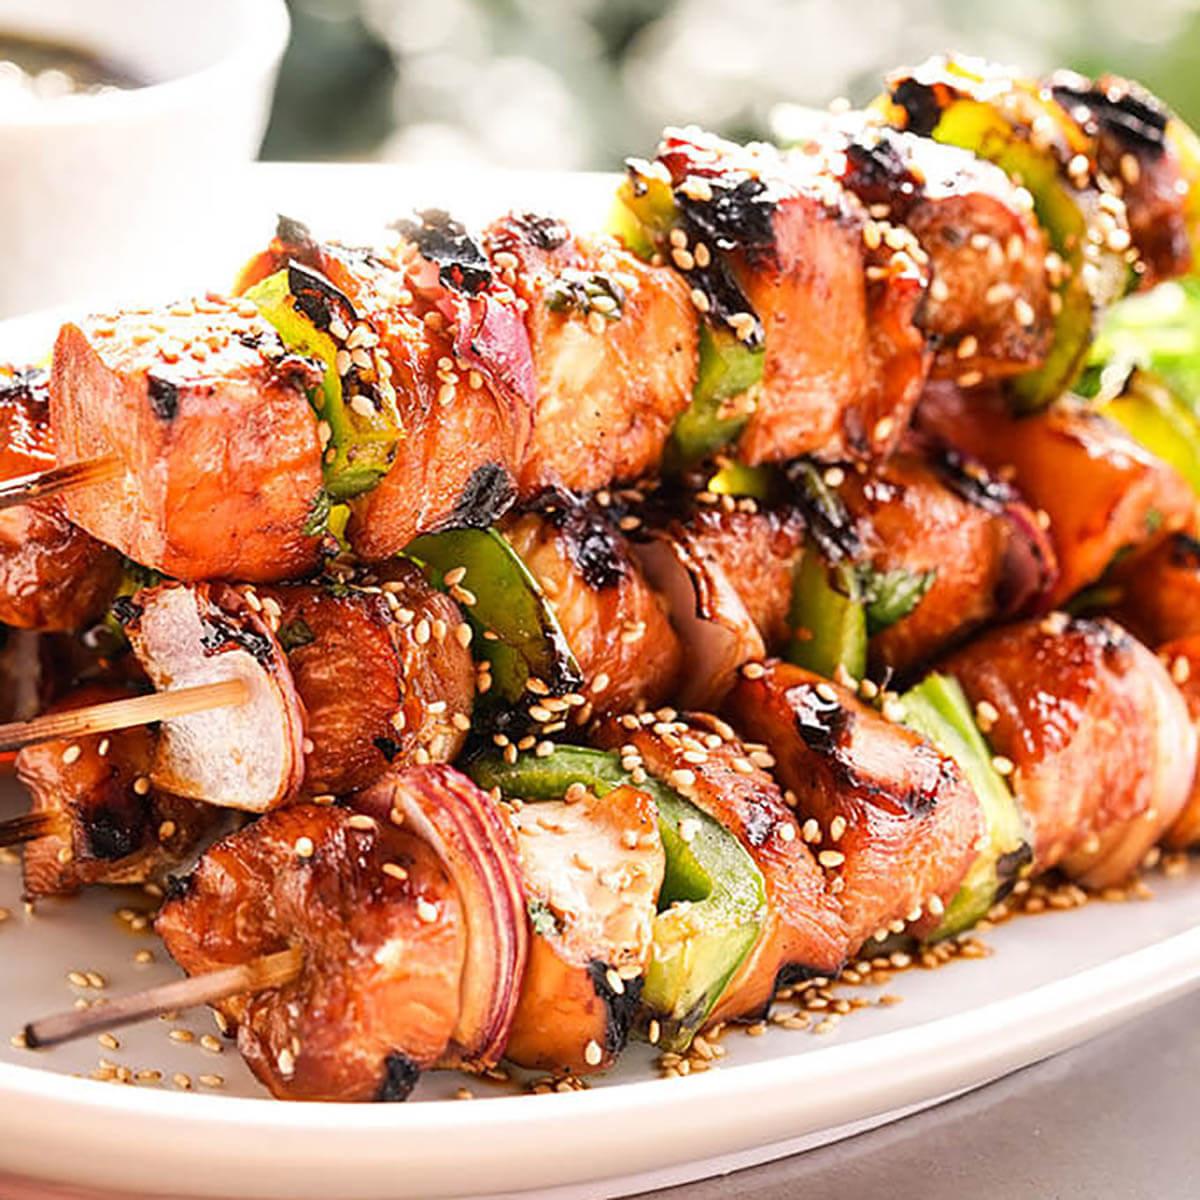 A platter filled with grilled teriyaki chicken kabobs sprinkled with sesame seeds for garnish.